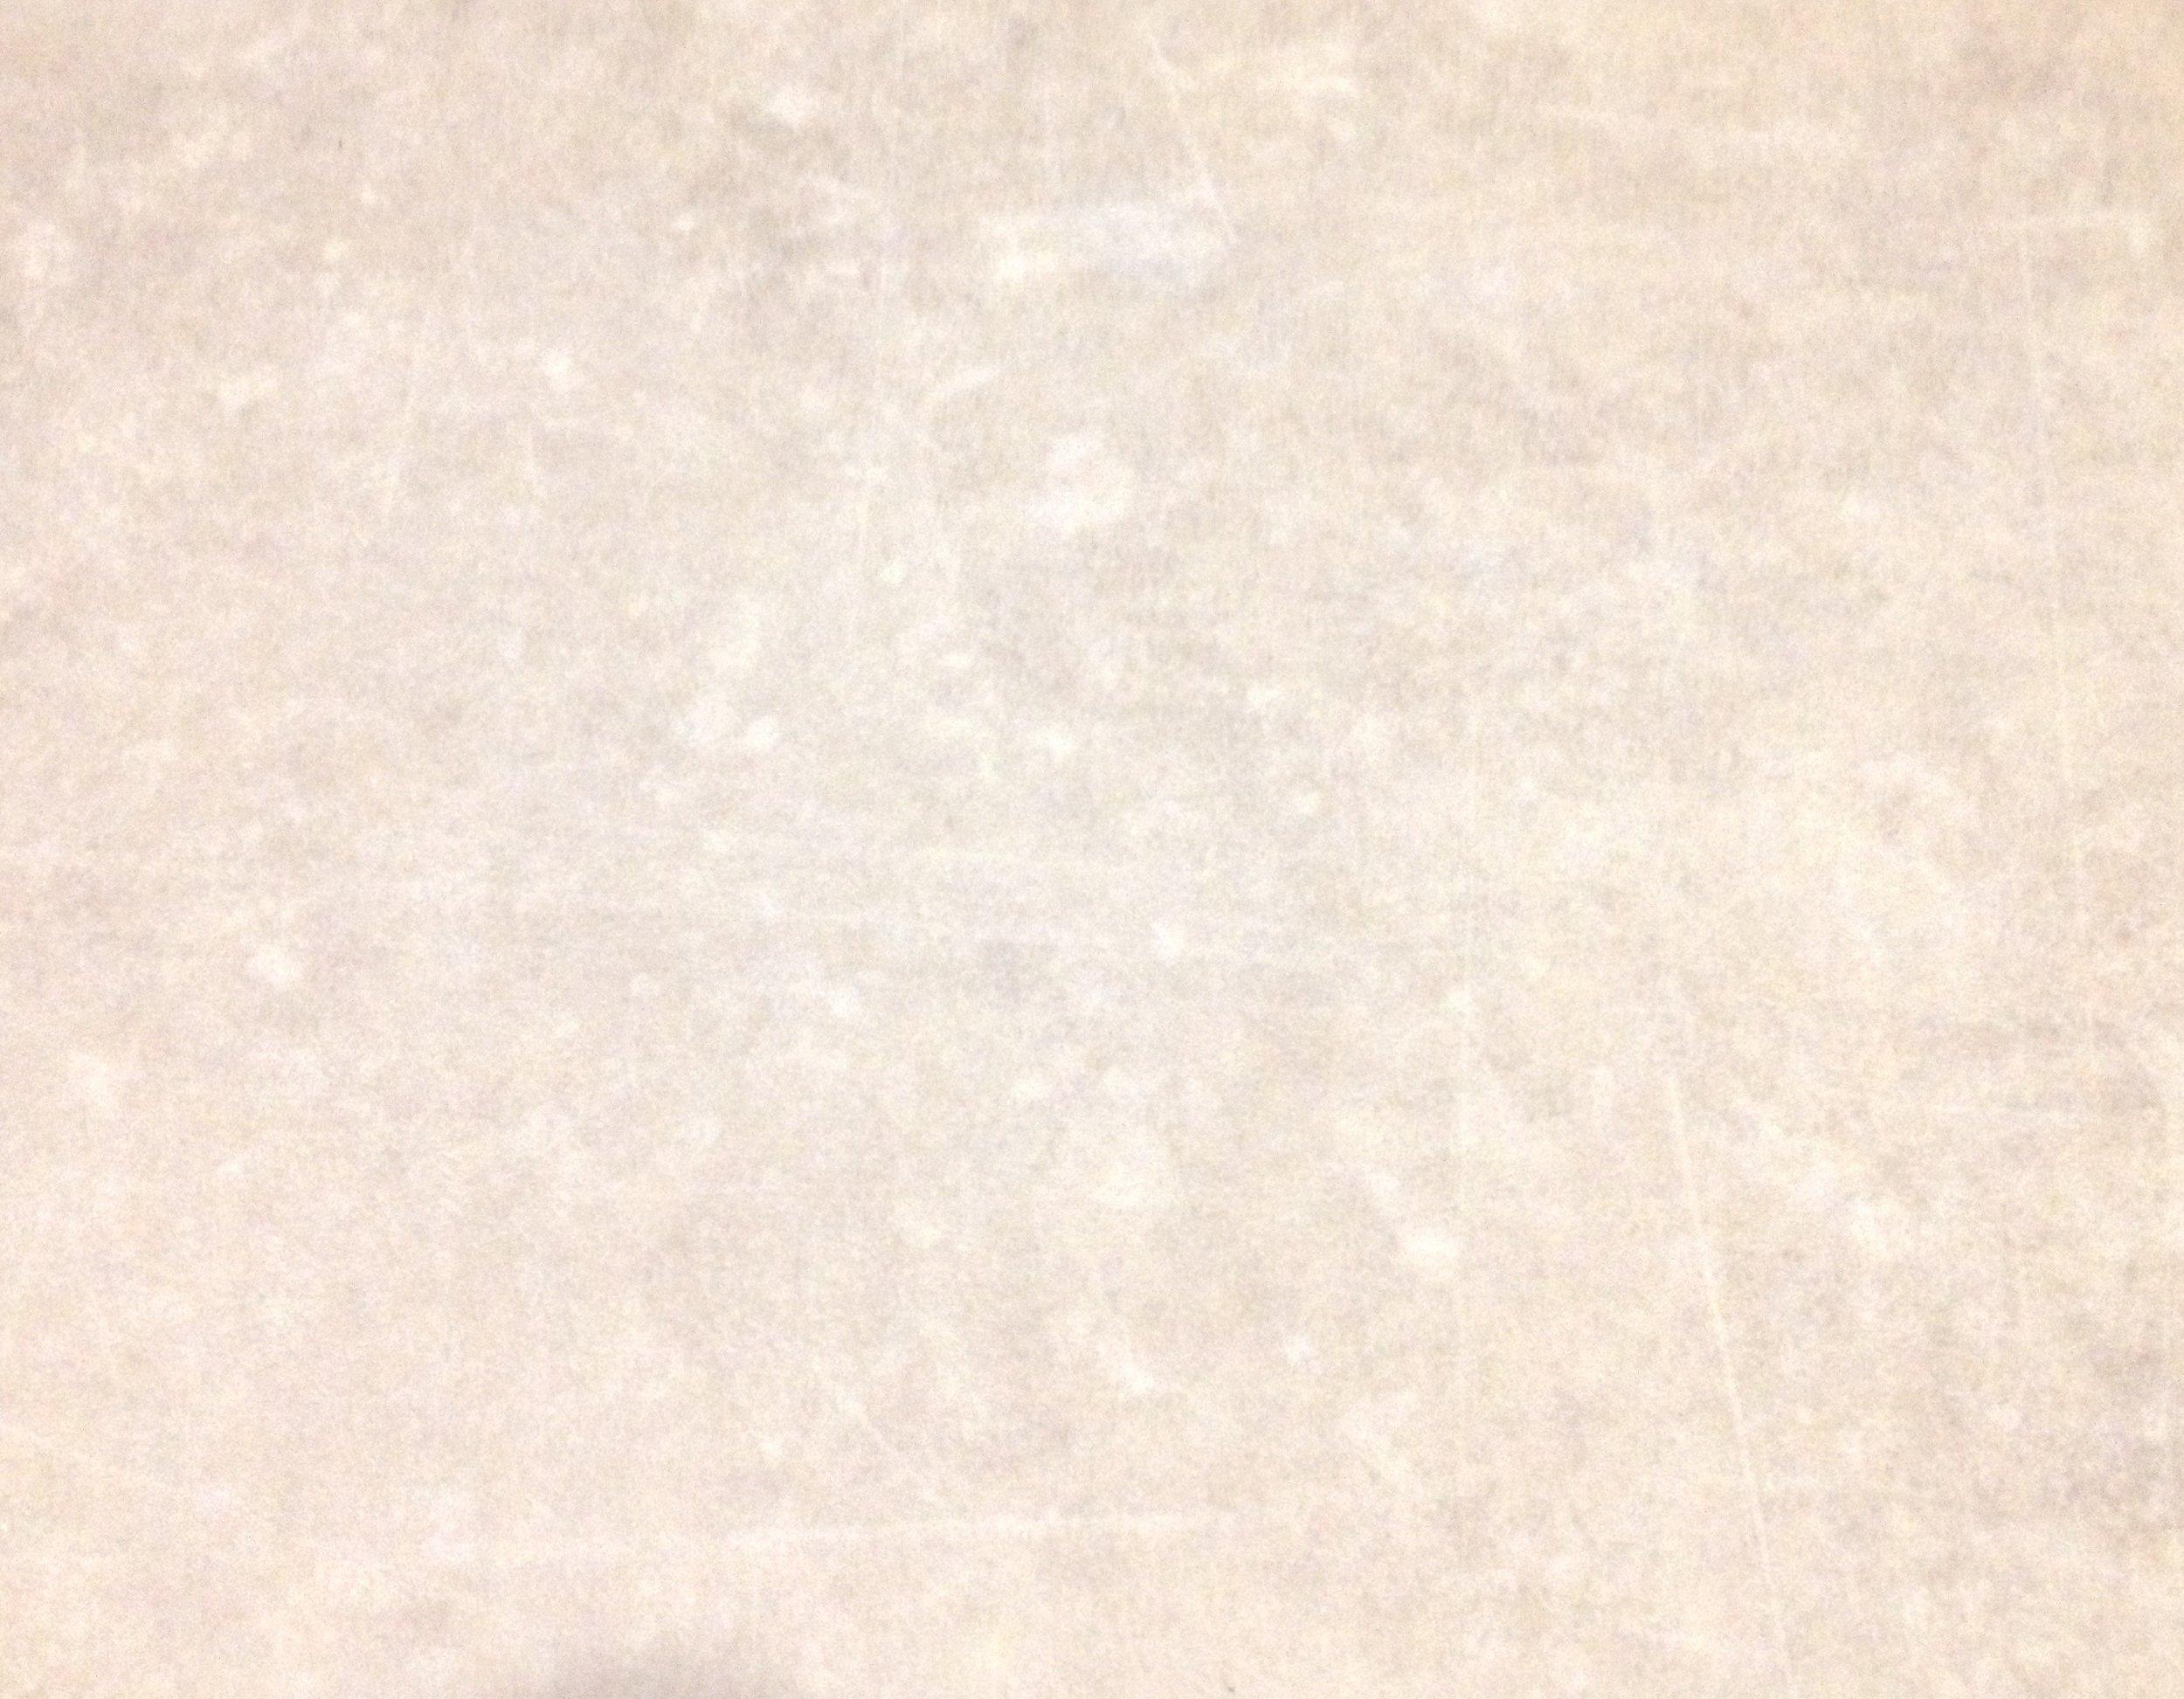 BeauFlor-E101 stone